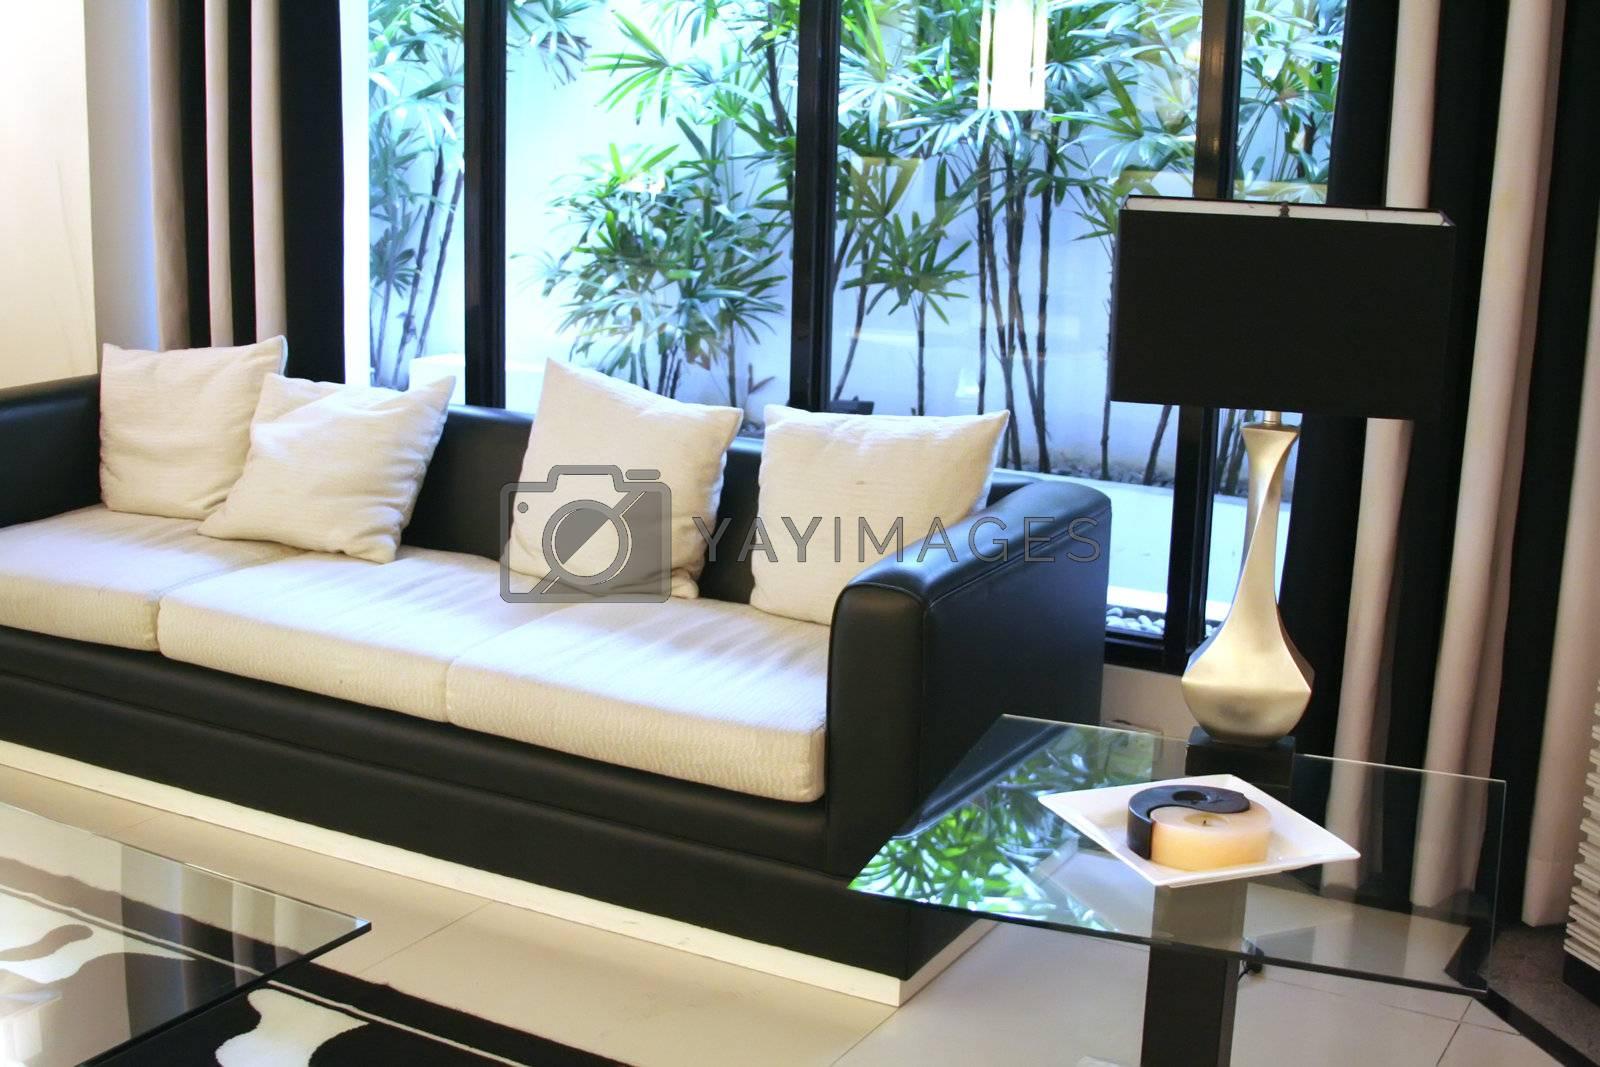 Living room waiting room with elegant modern black and white design